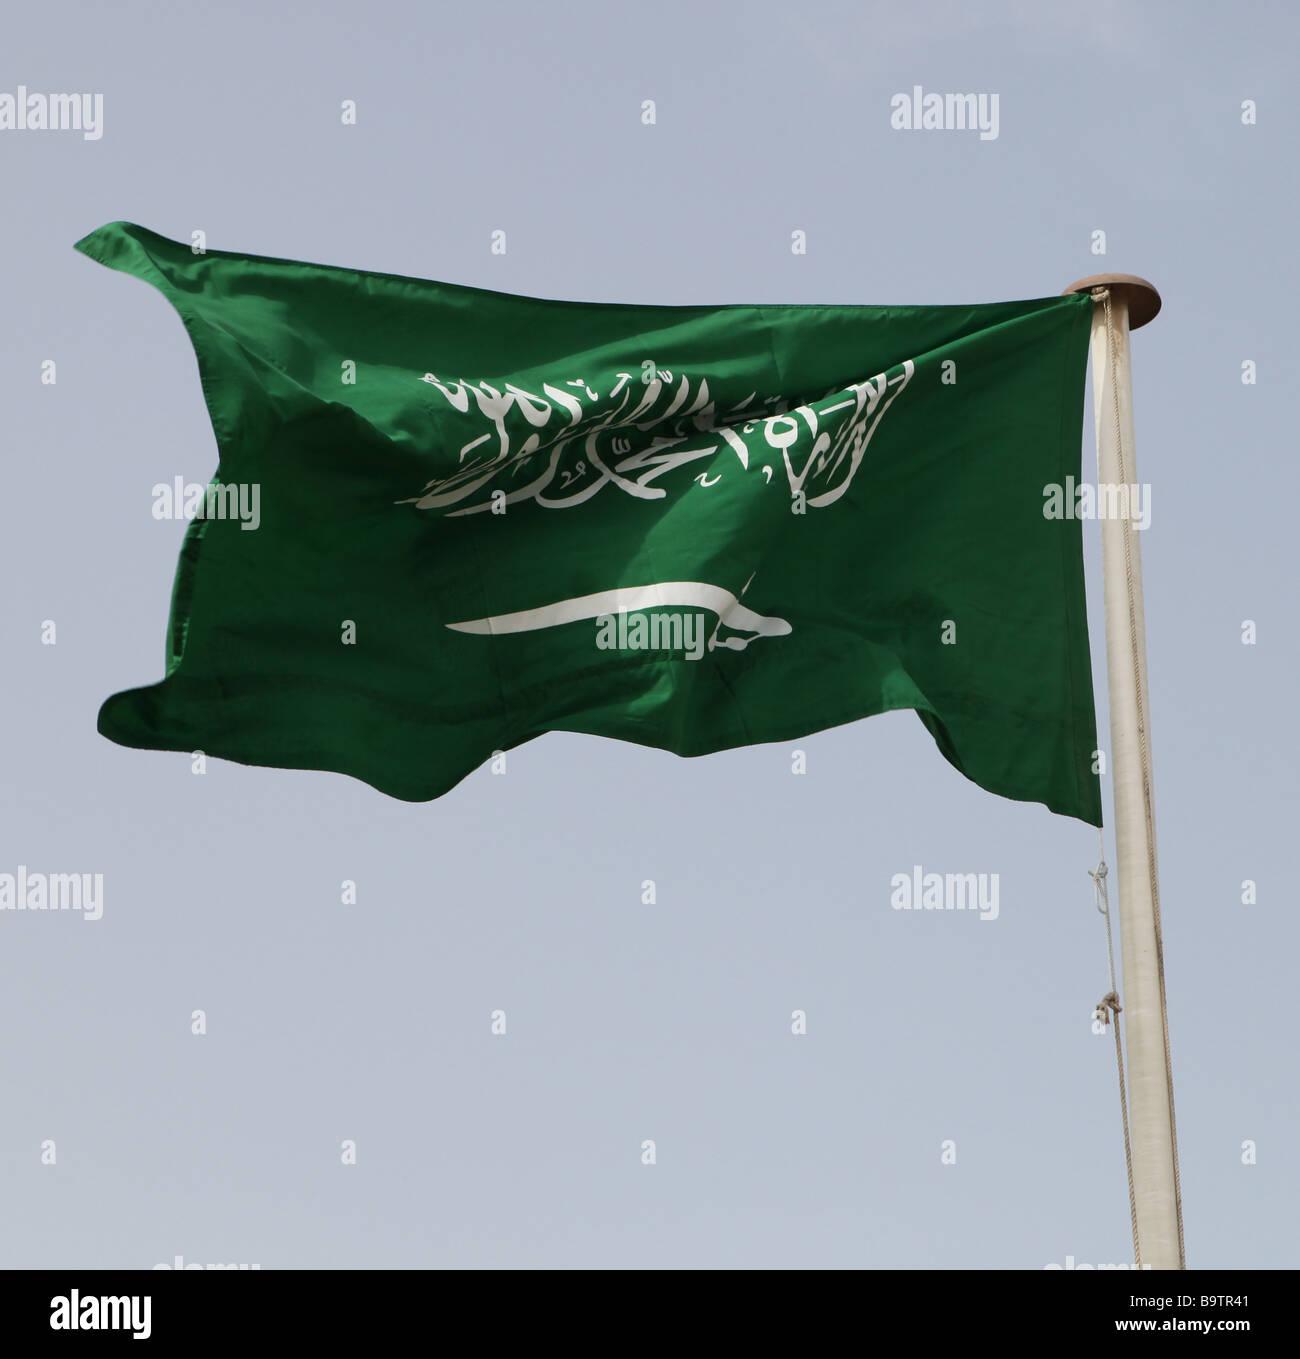 Saudi Arabia Oil Stock Photos & Saudi Arabia Oil Stock